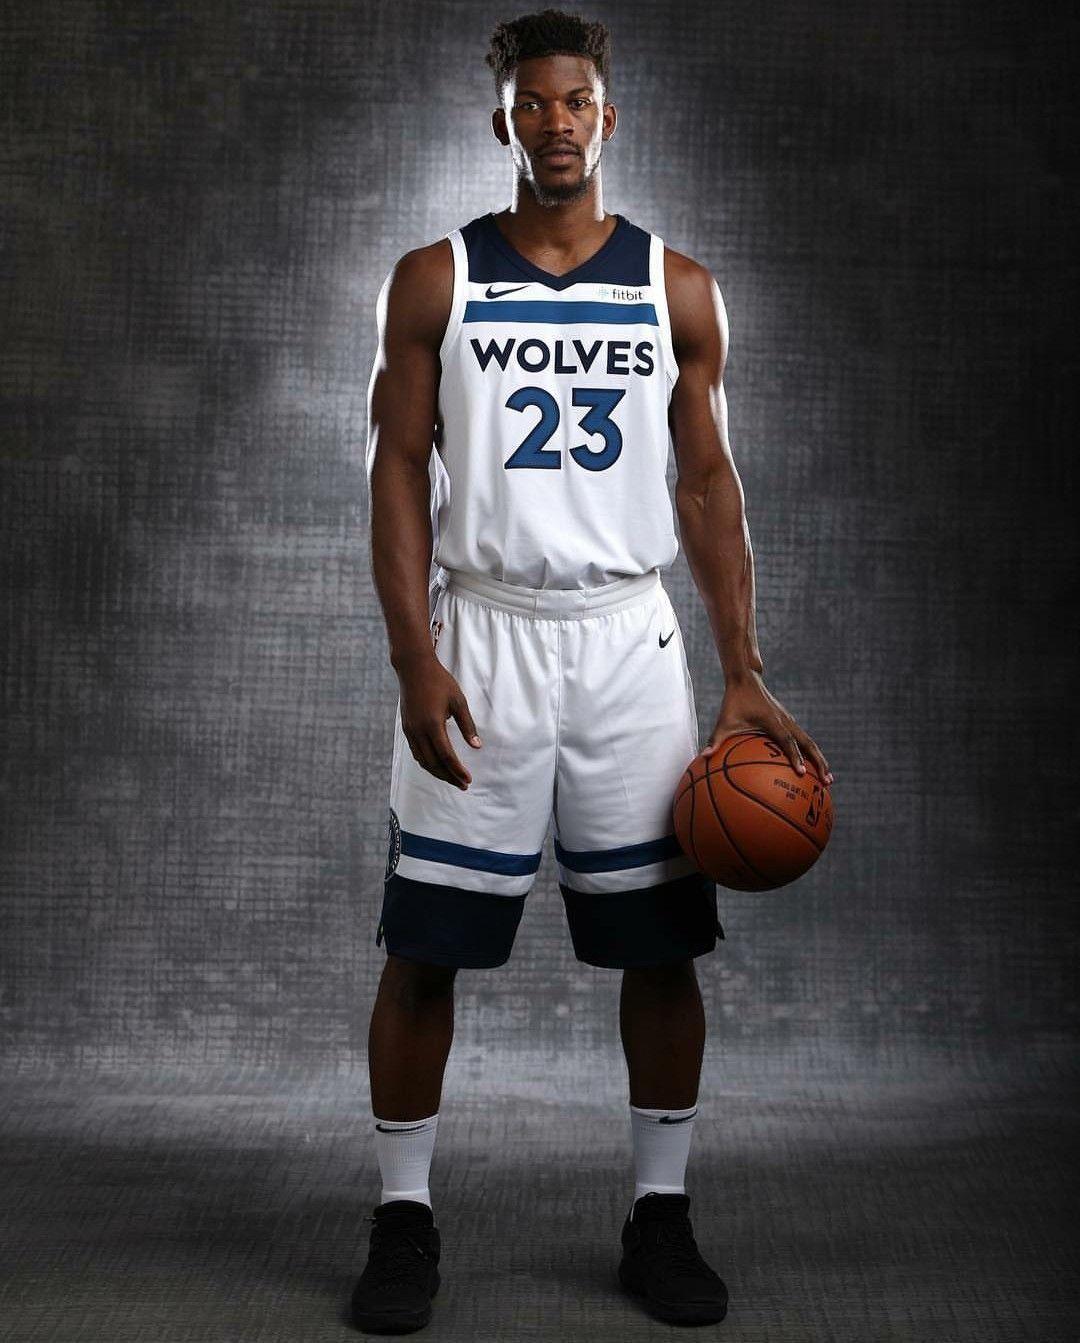 Jimmy Butler Wallpaper Probasketball Basketball Jersey Outfit Basketball Uniforms Design Girls Basketball Shoes